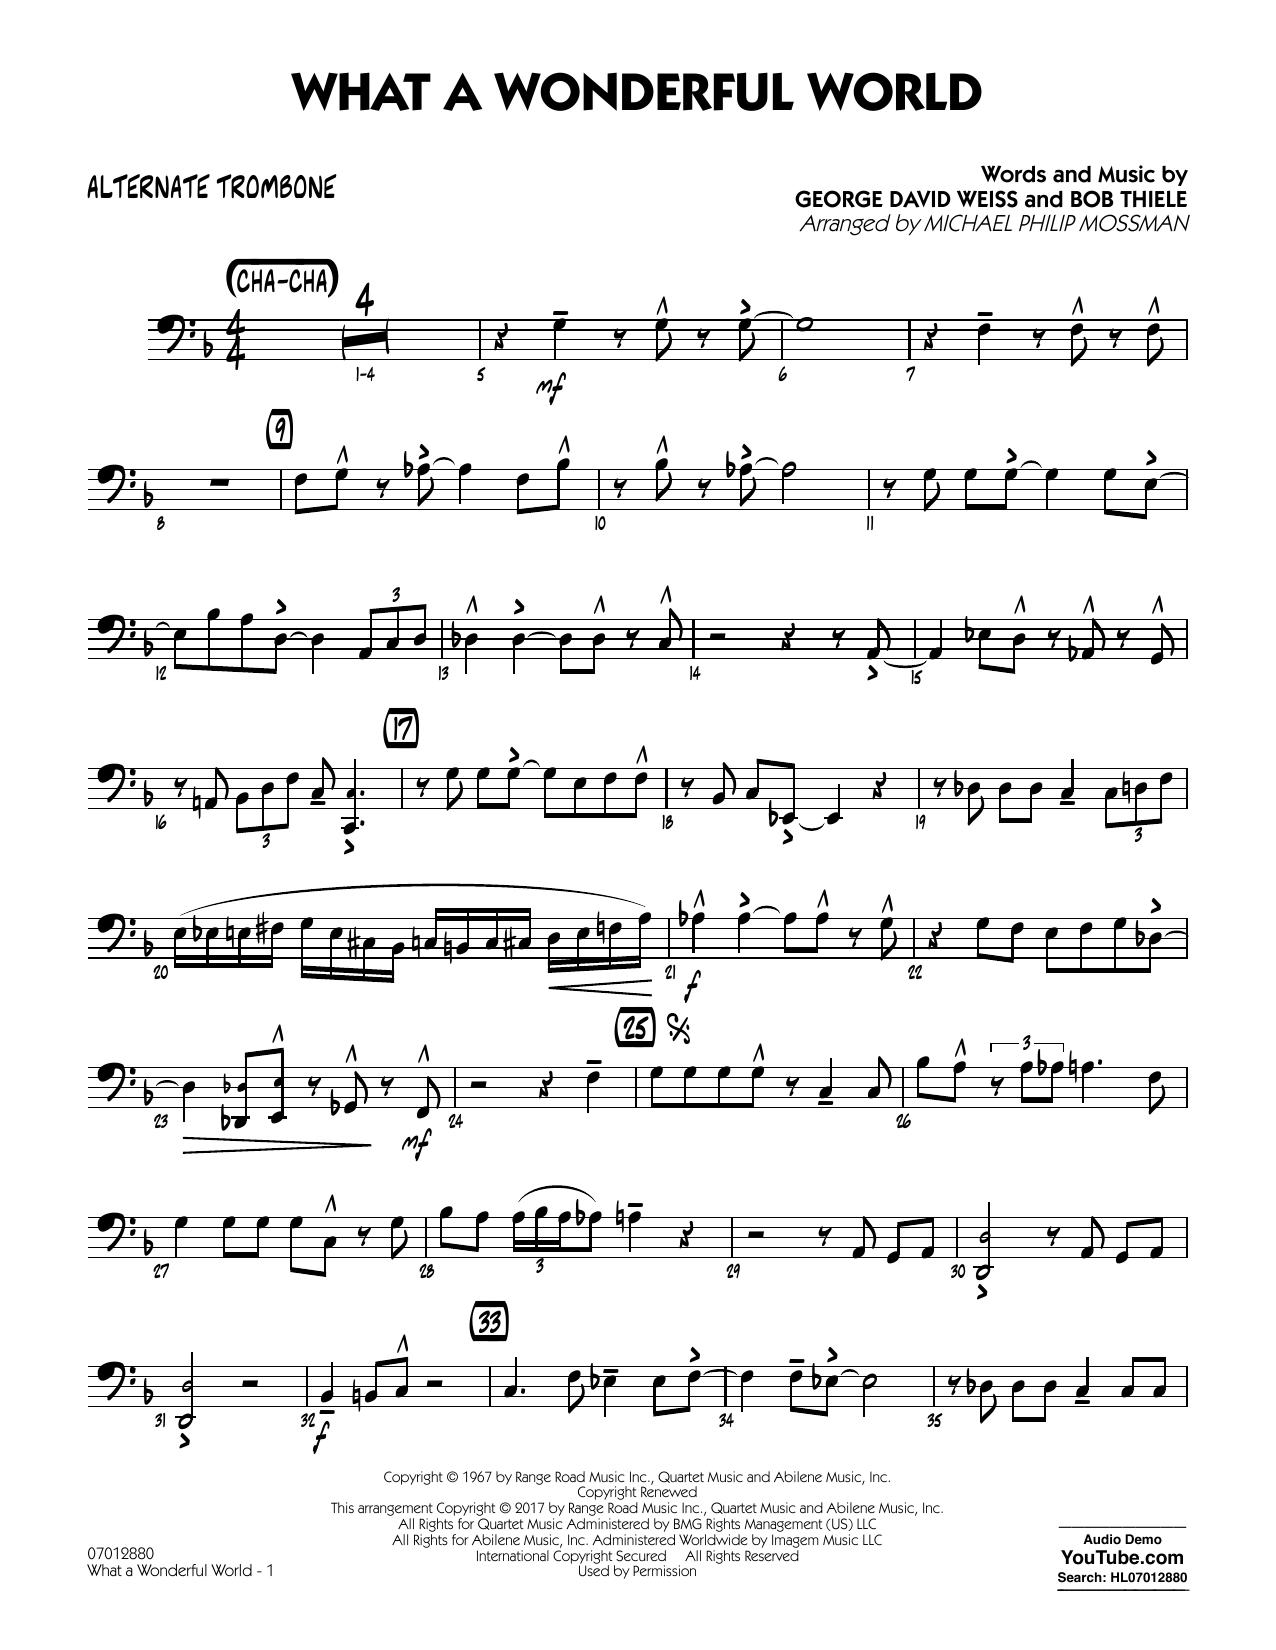 What A Wonderful World Dl - Alternate Trombone (Jazz Ensemble)